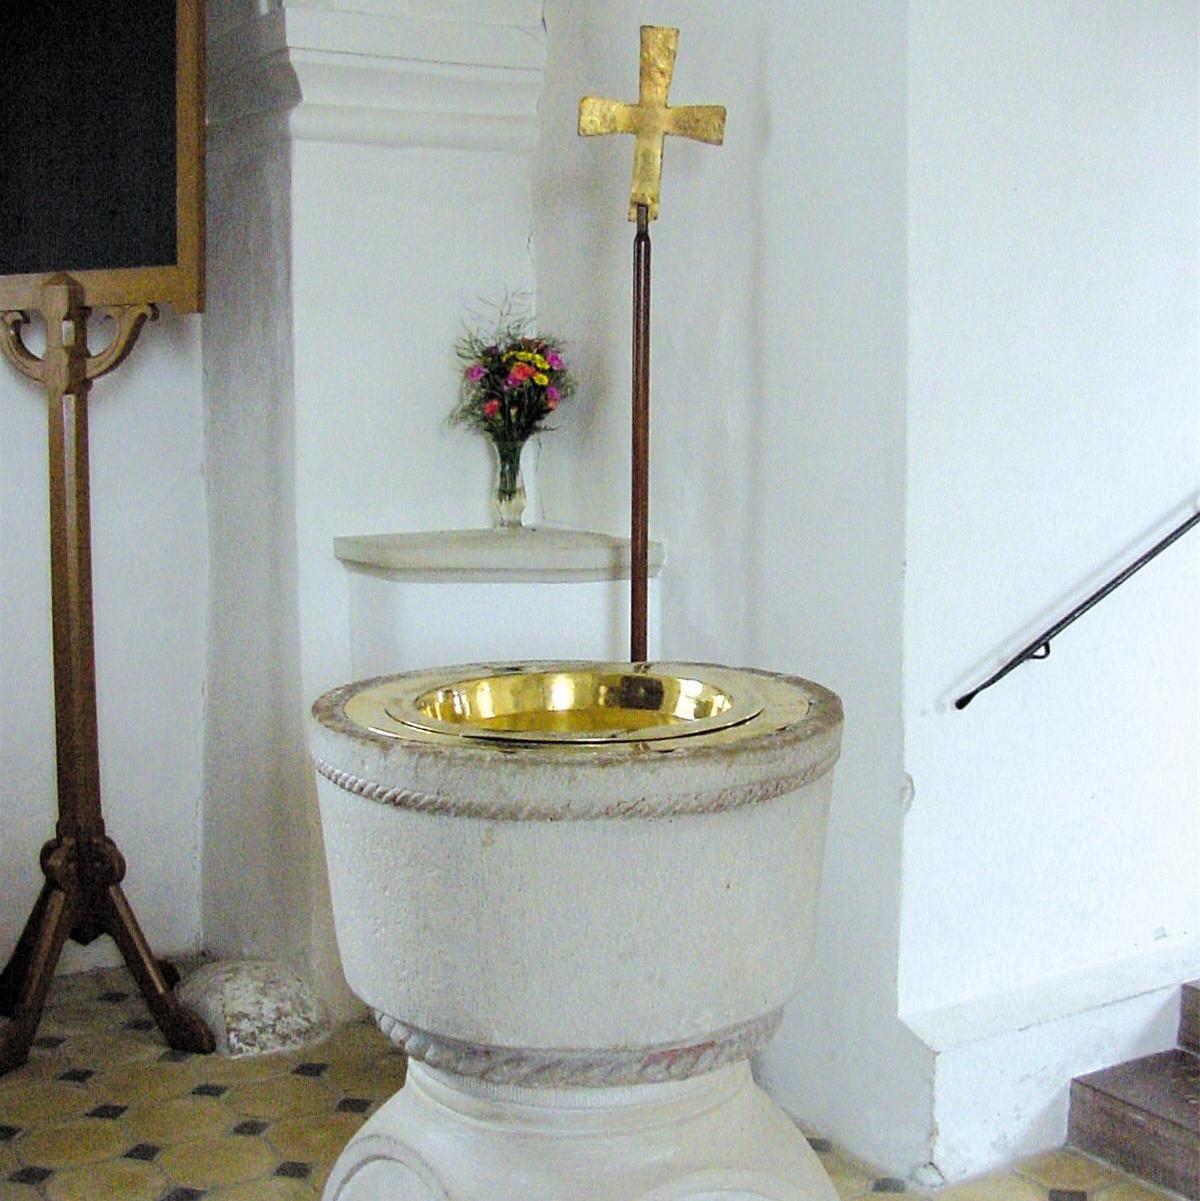 © Kävlinge kommun, Löddeköpinge Kirche